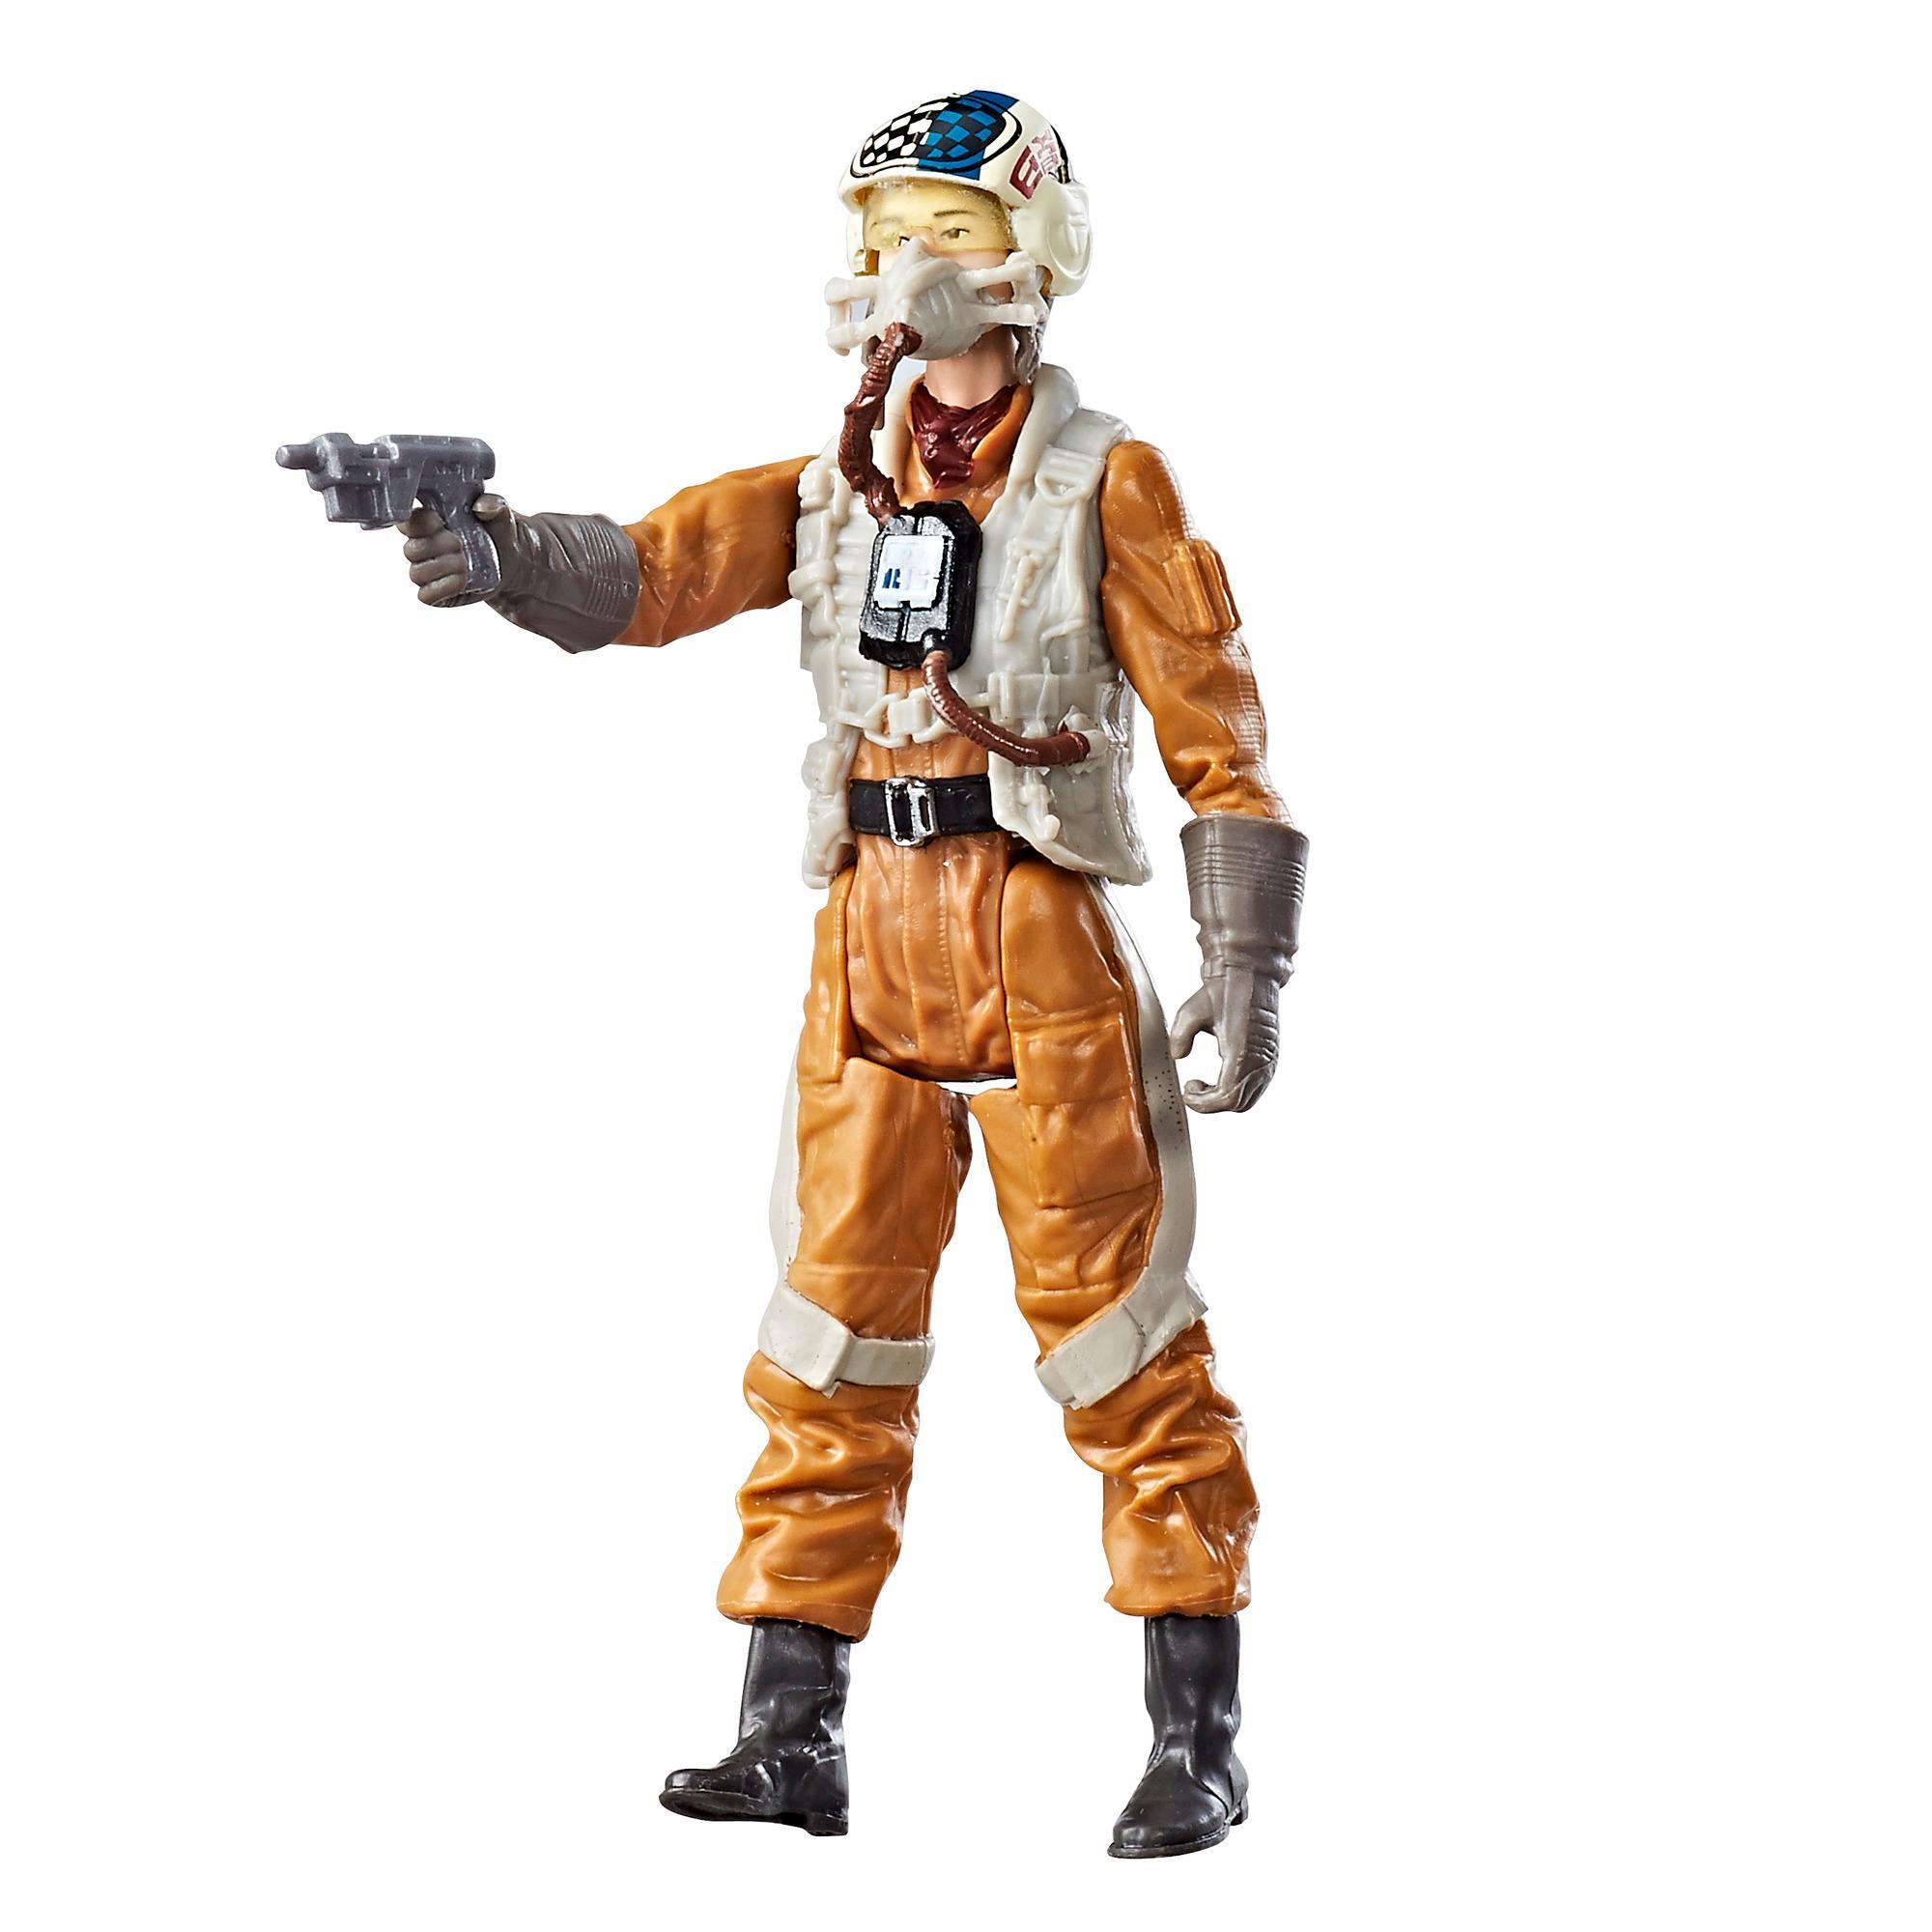 星際大戰電影8 3.75吋基本人物組Resistance Gunner Paige